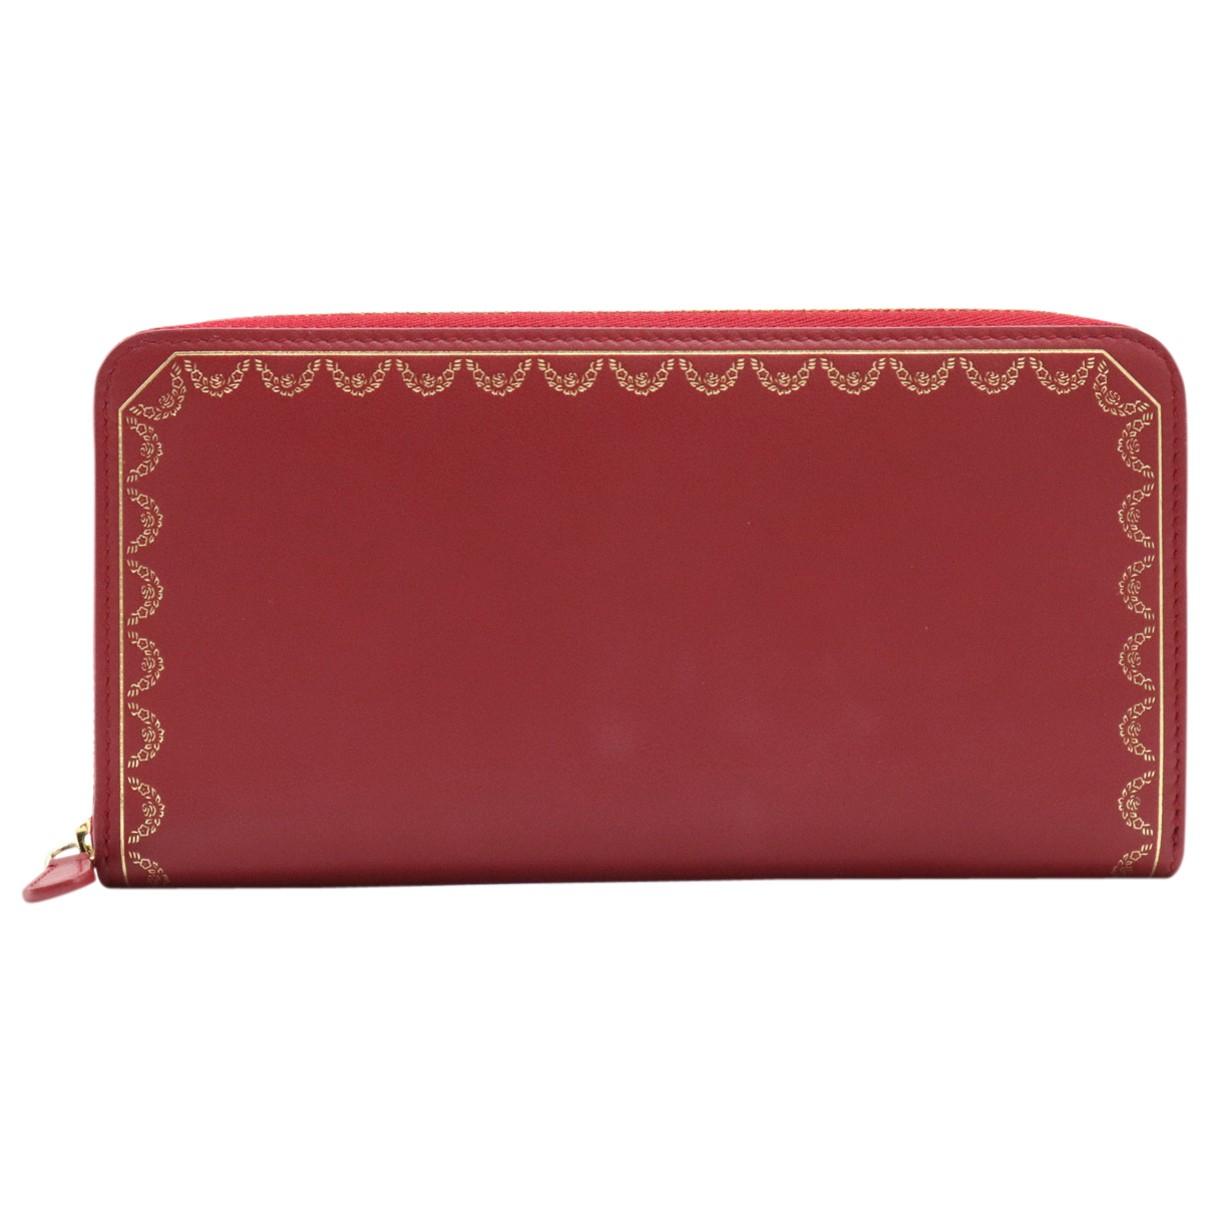 Cartier \N Portemonnaie in  Rot Leder